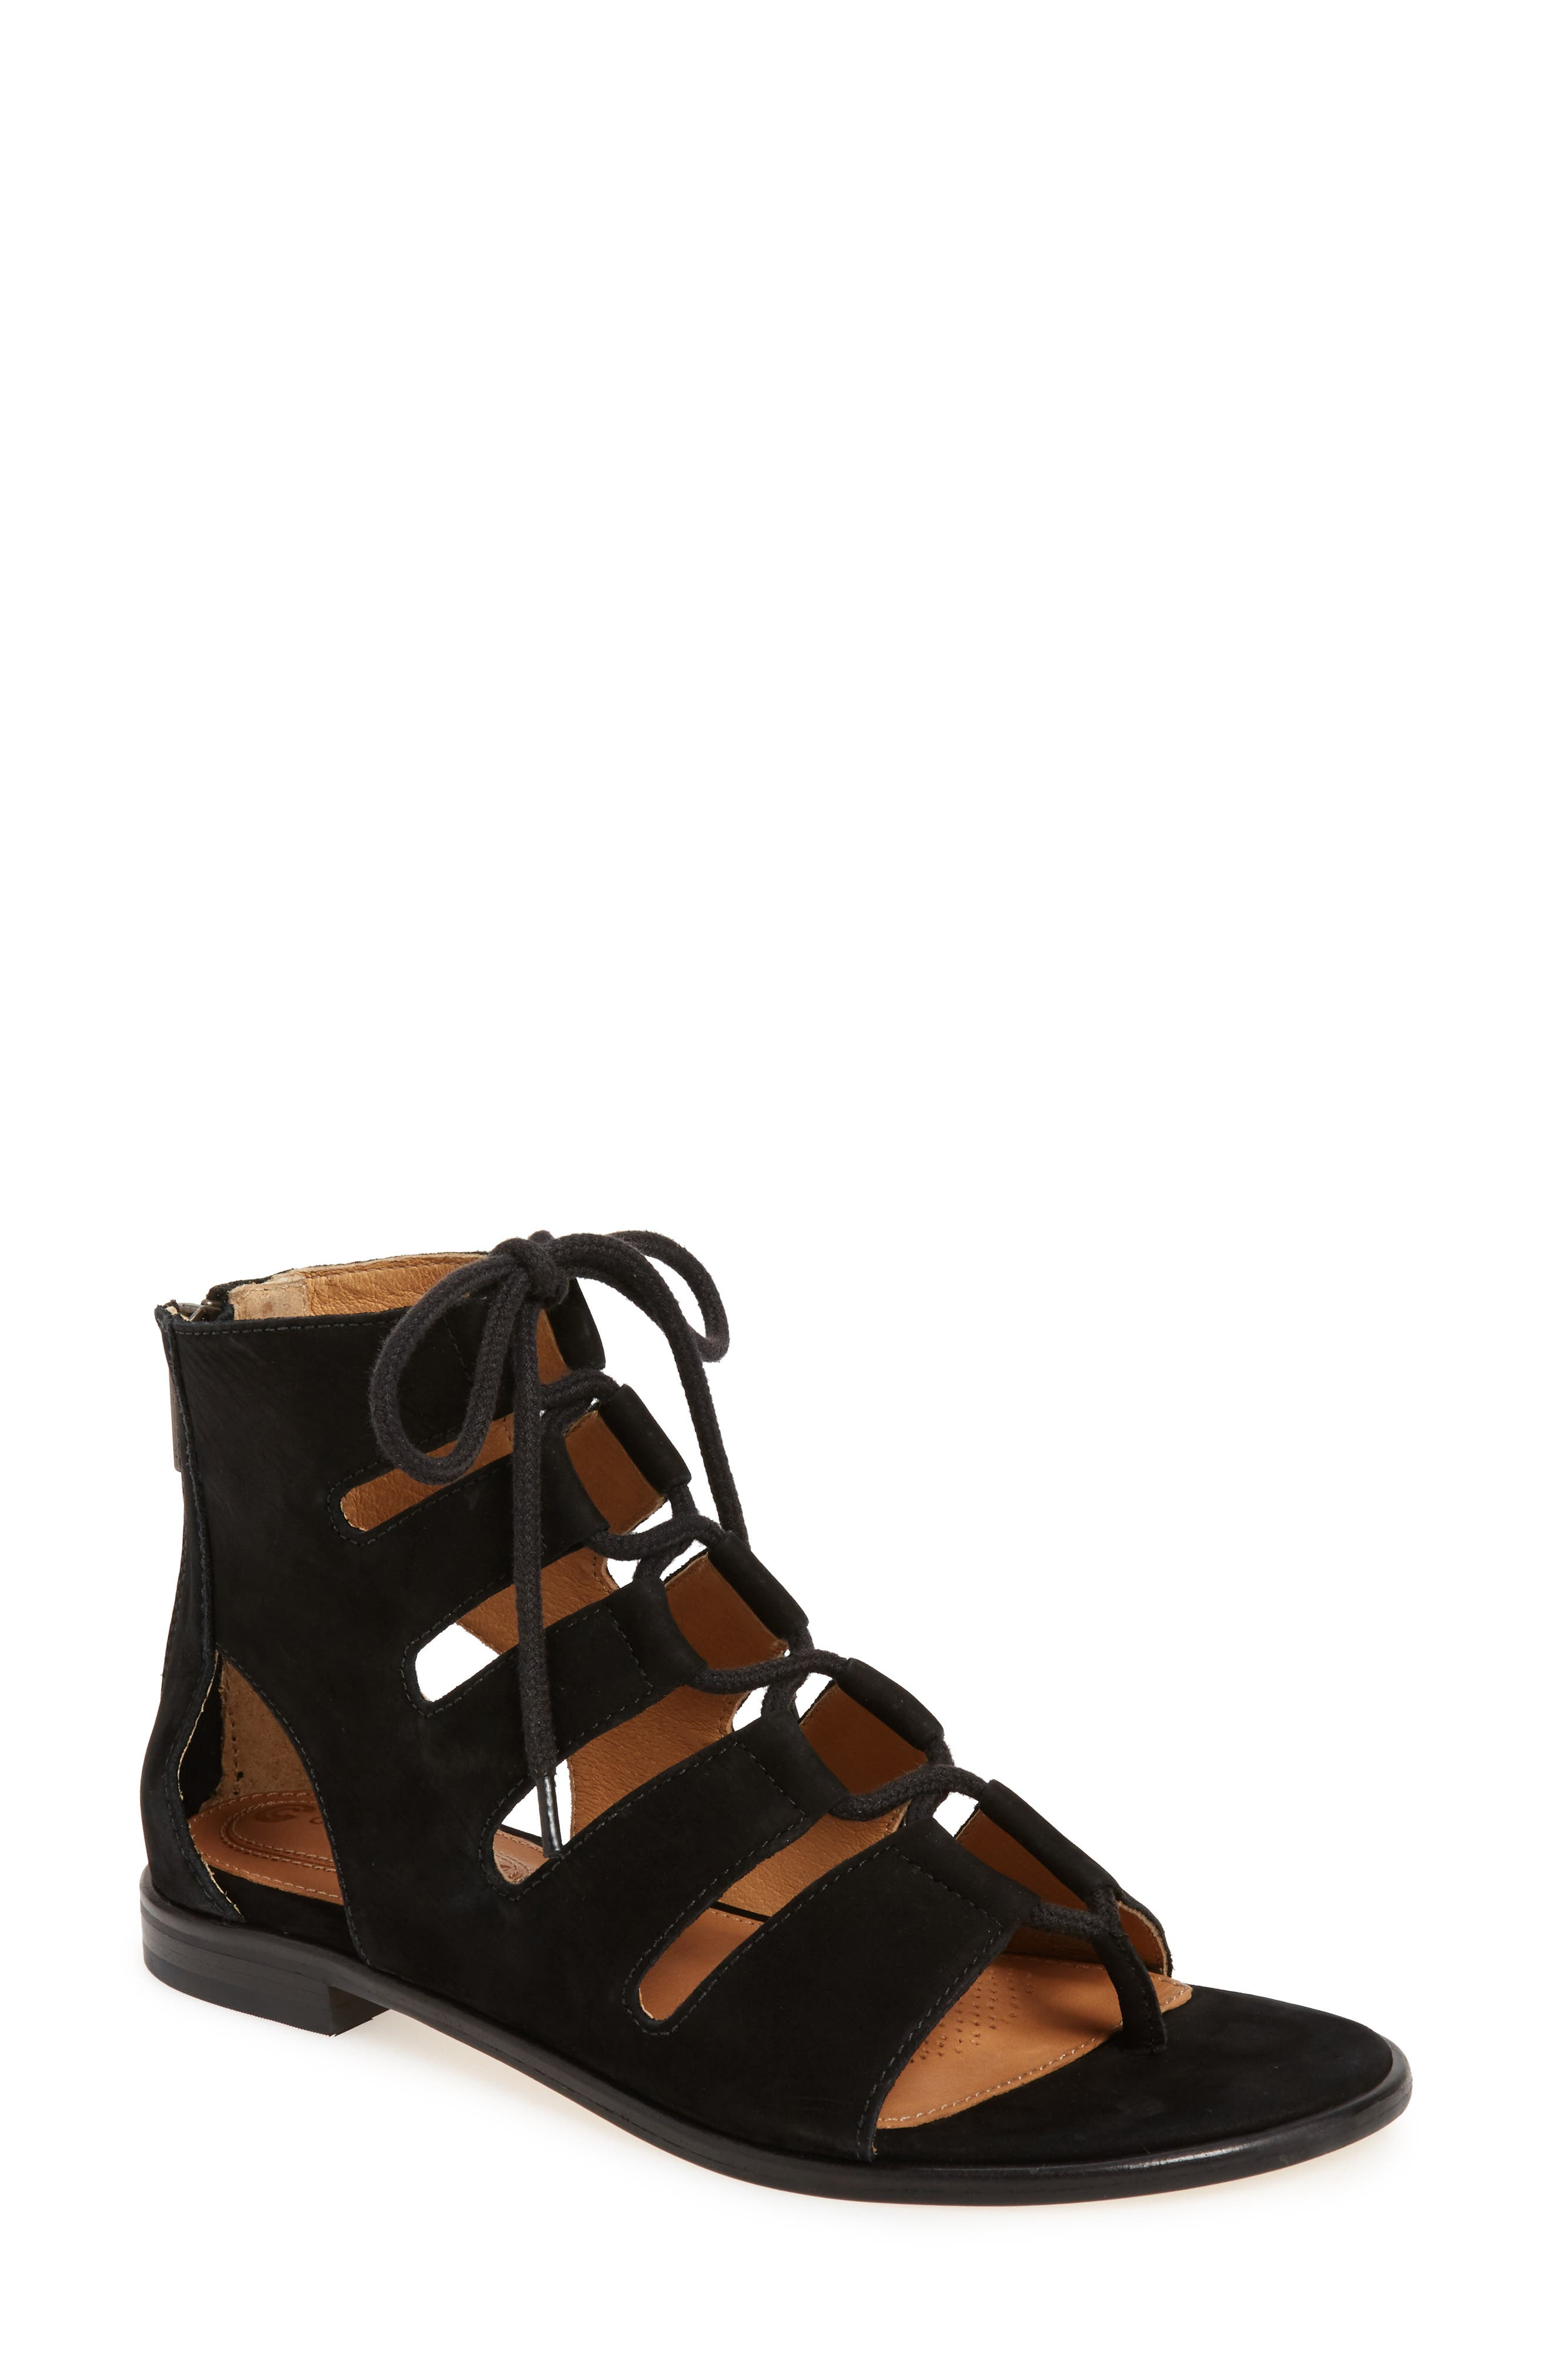 Main Image - Corso Como Sunrise Ghillie Gladiator Sandal (Women)